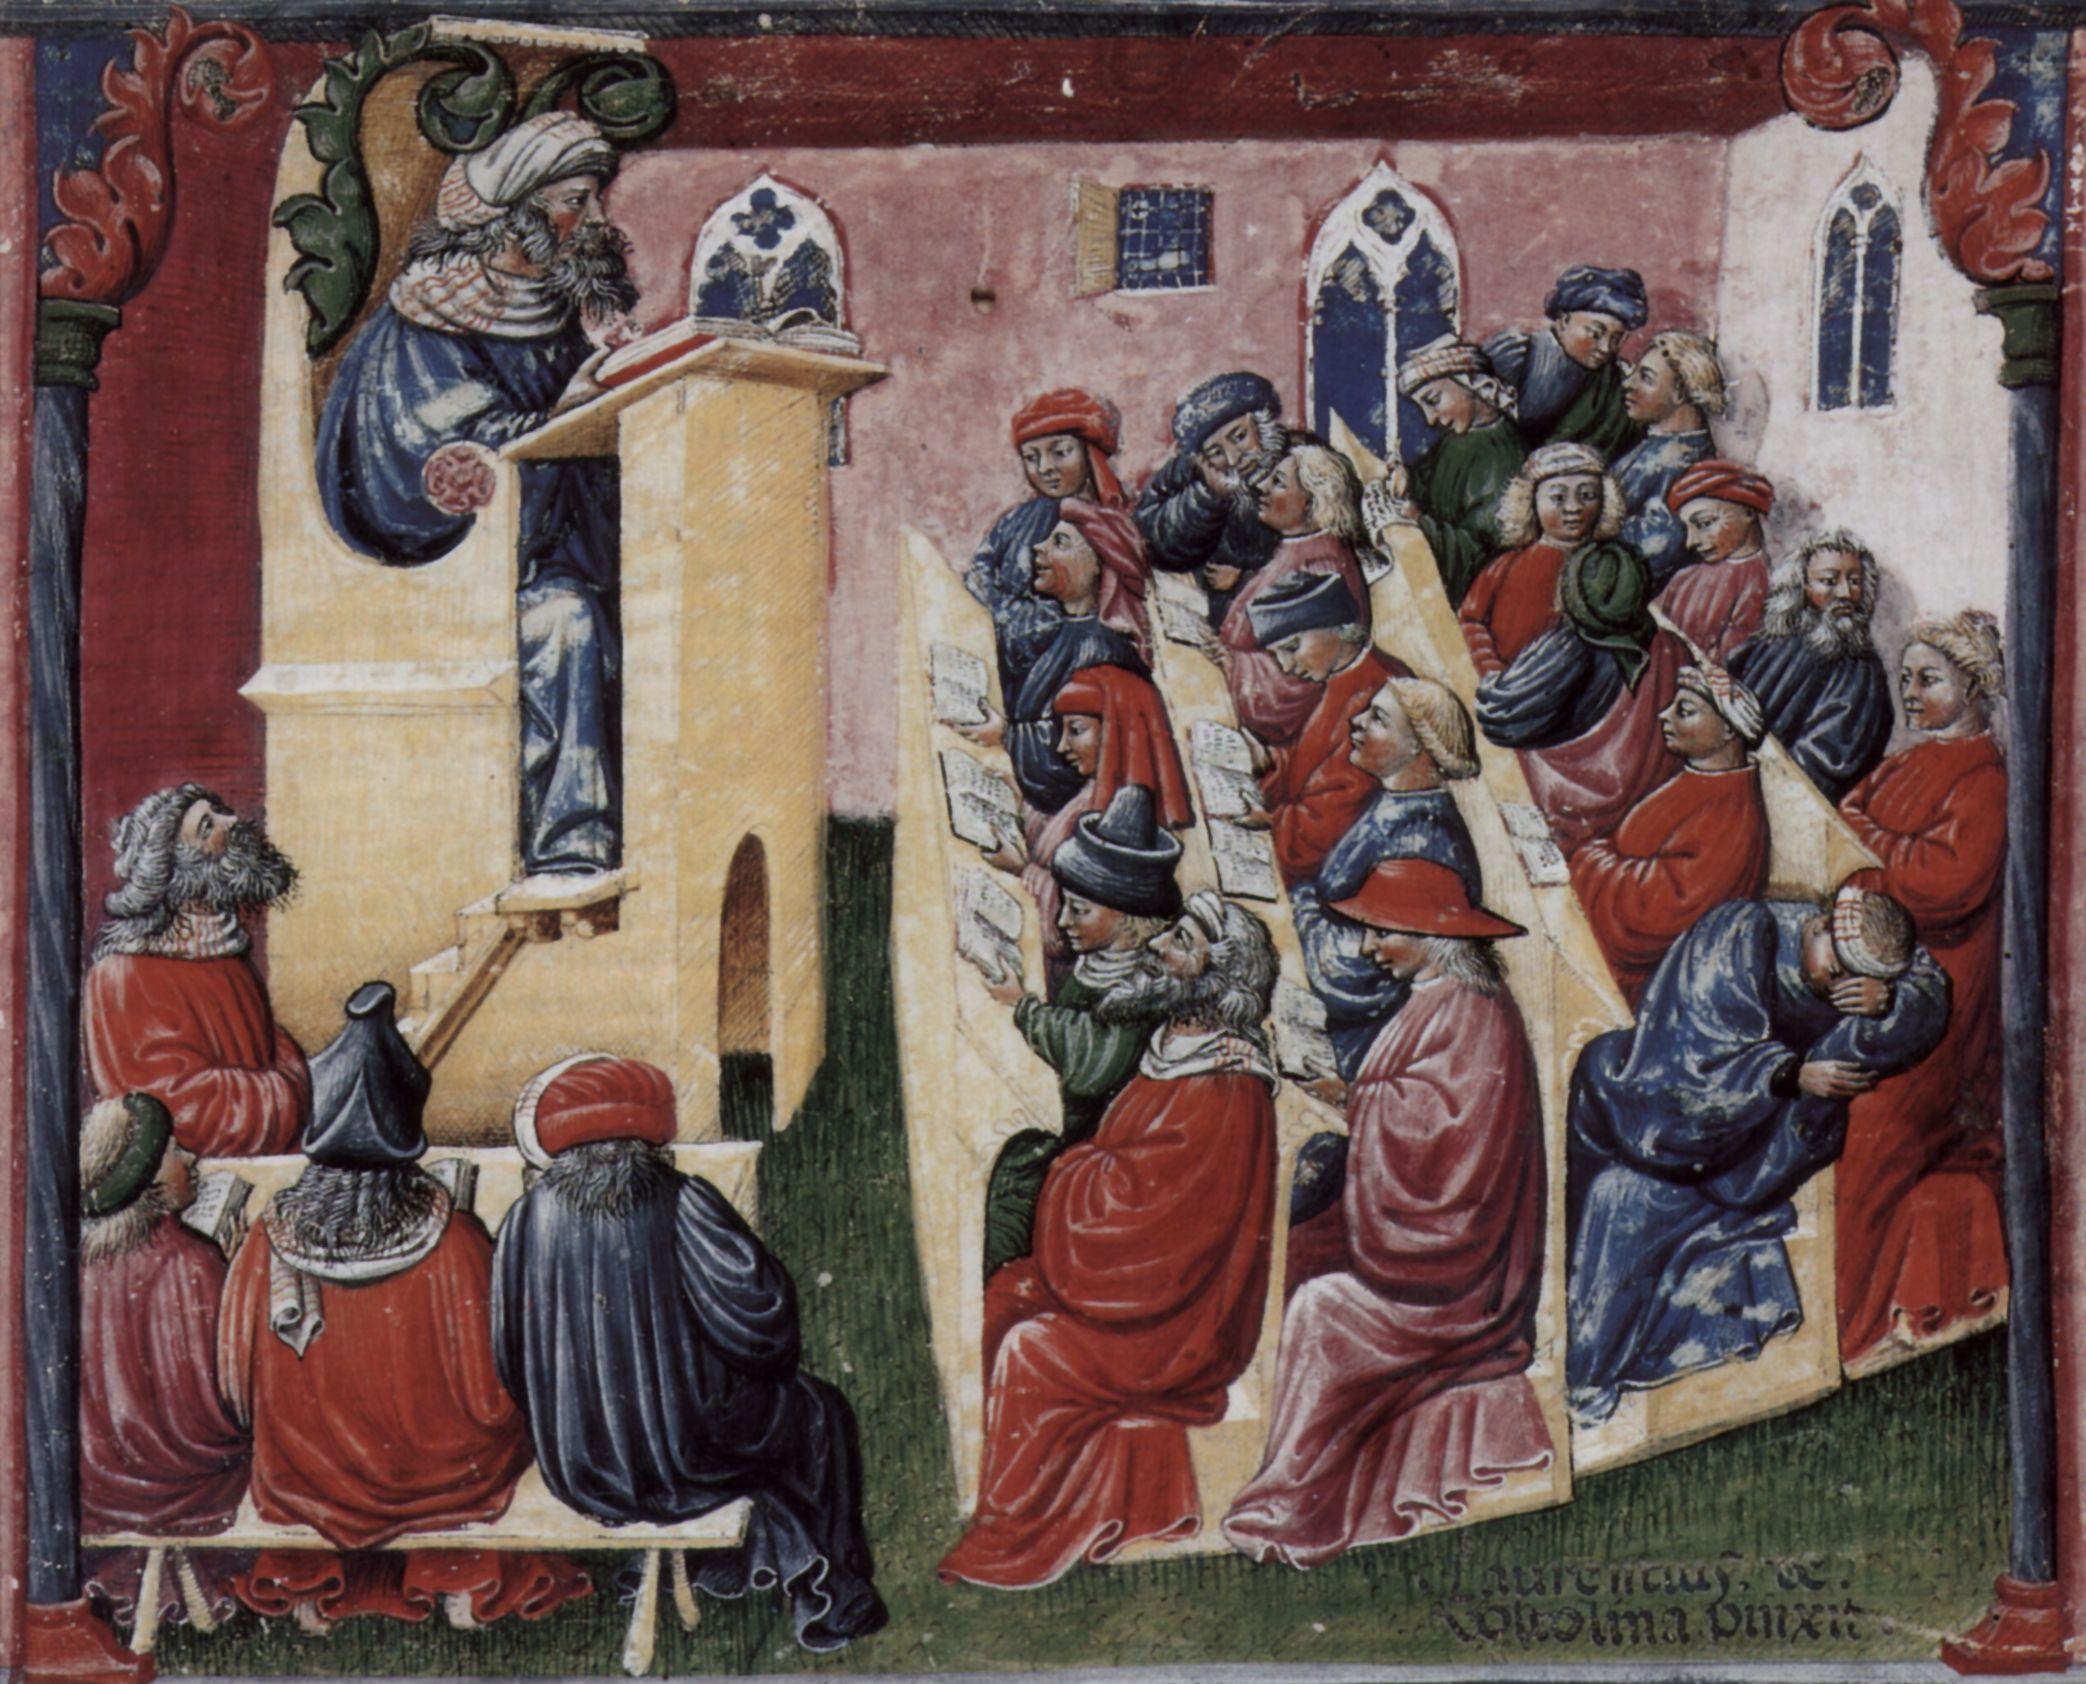 A medieval university